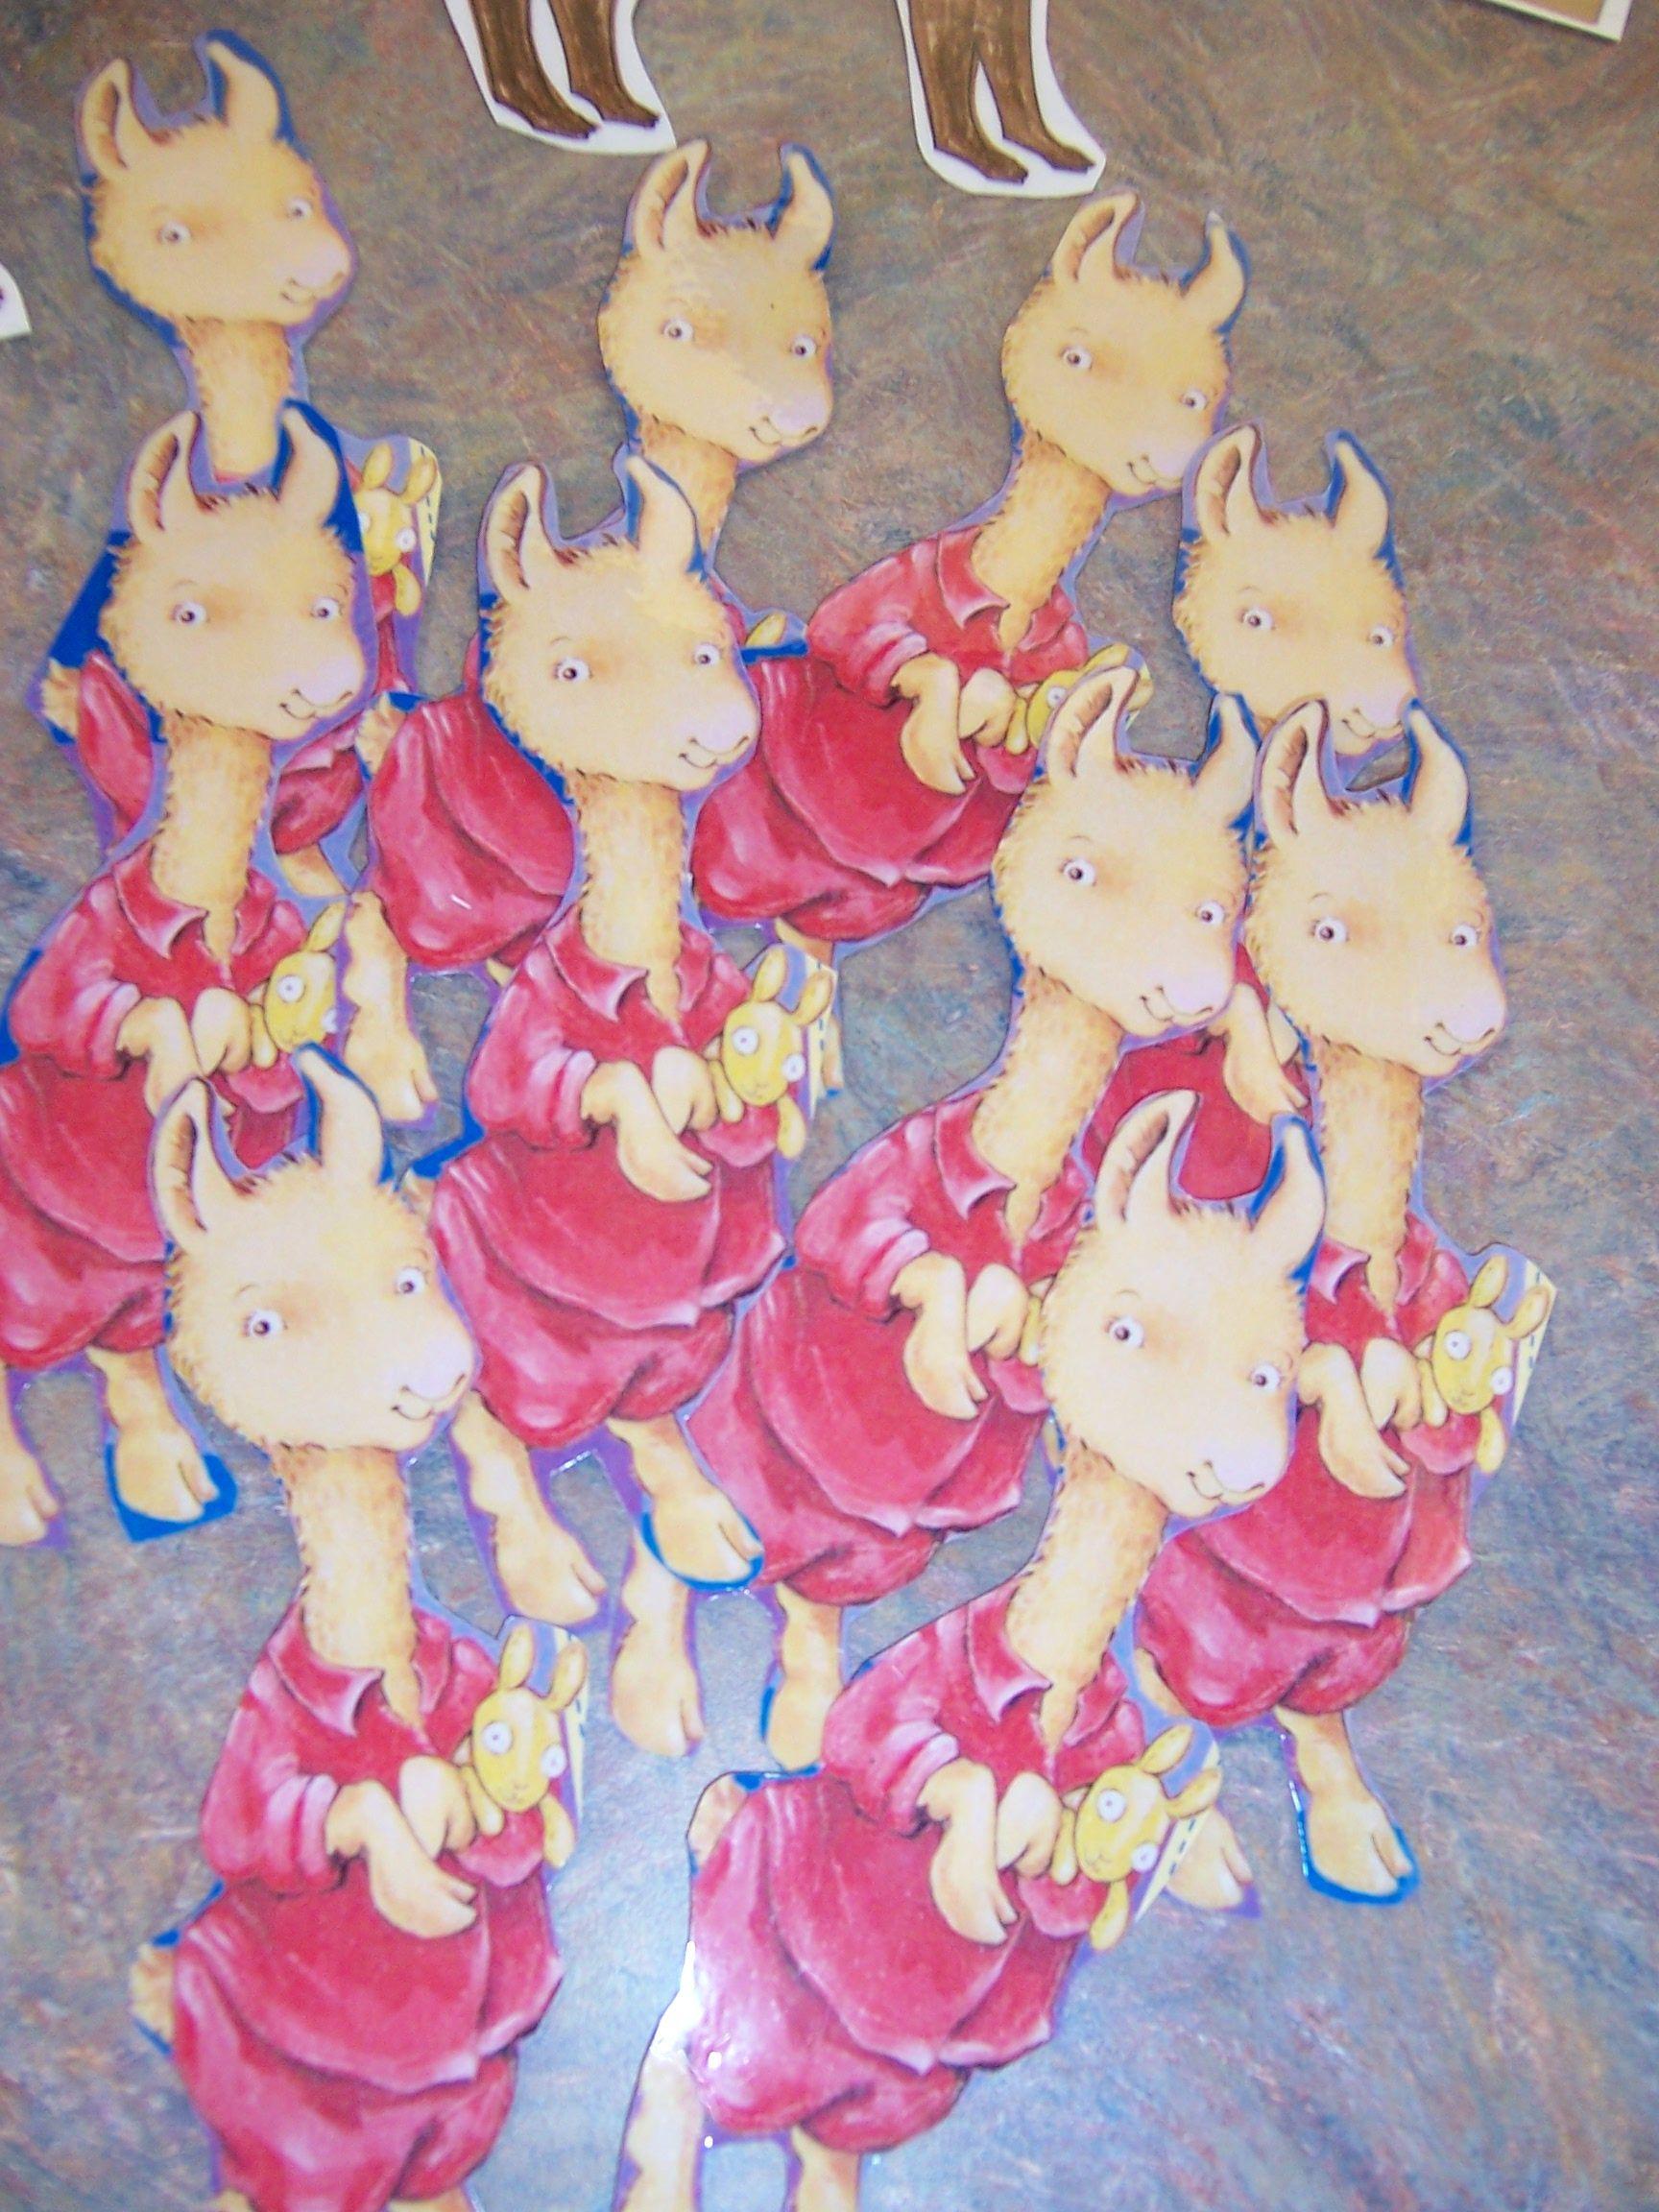 Llama Storytime I Used The Llama Llama Template From The Llama